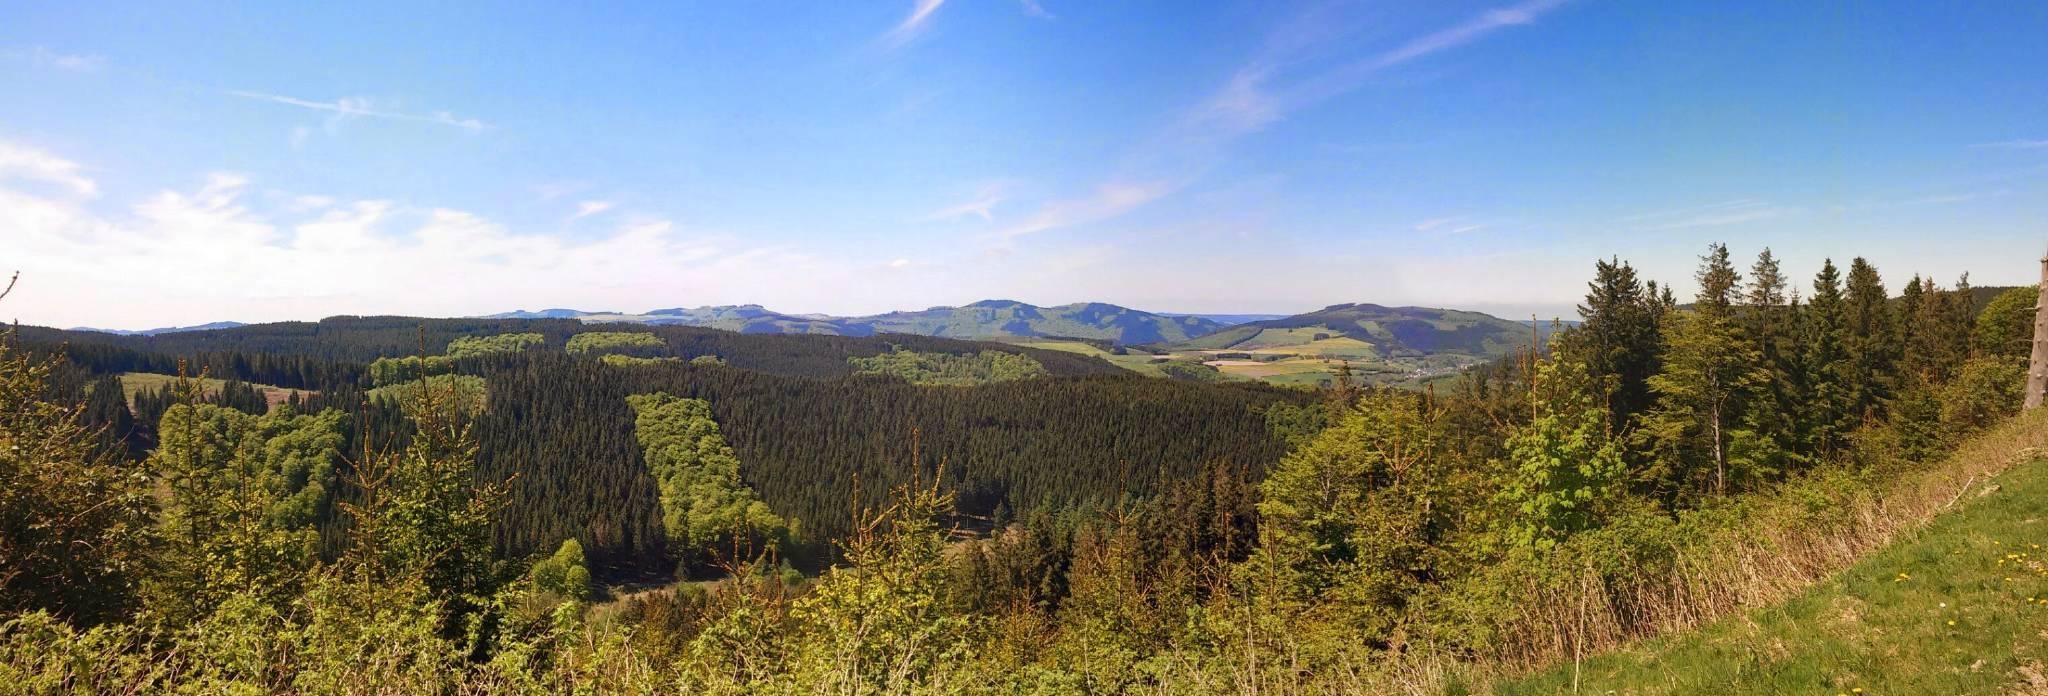 Blick vom Rothaarsteig ins Tal